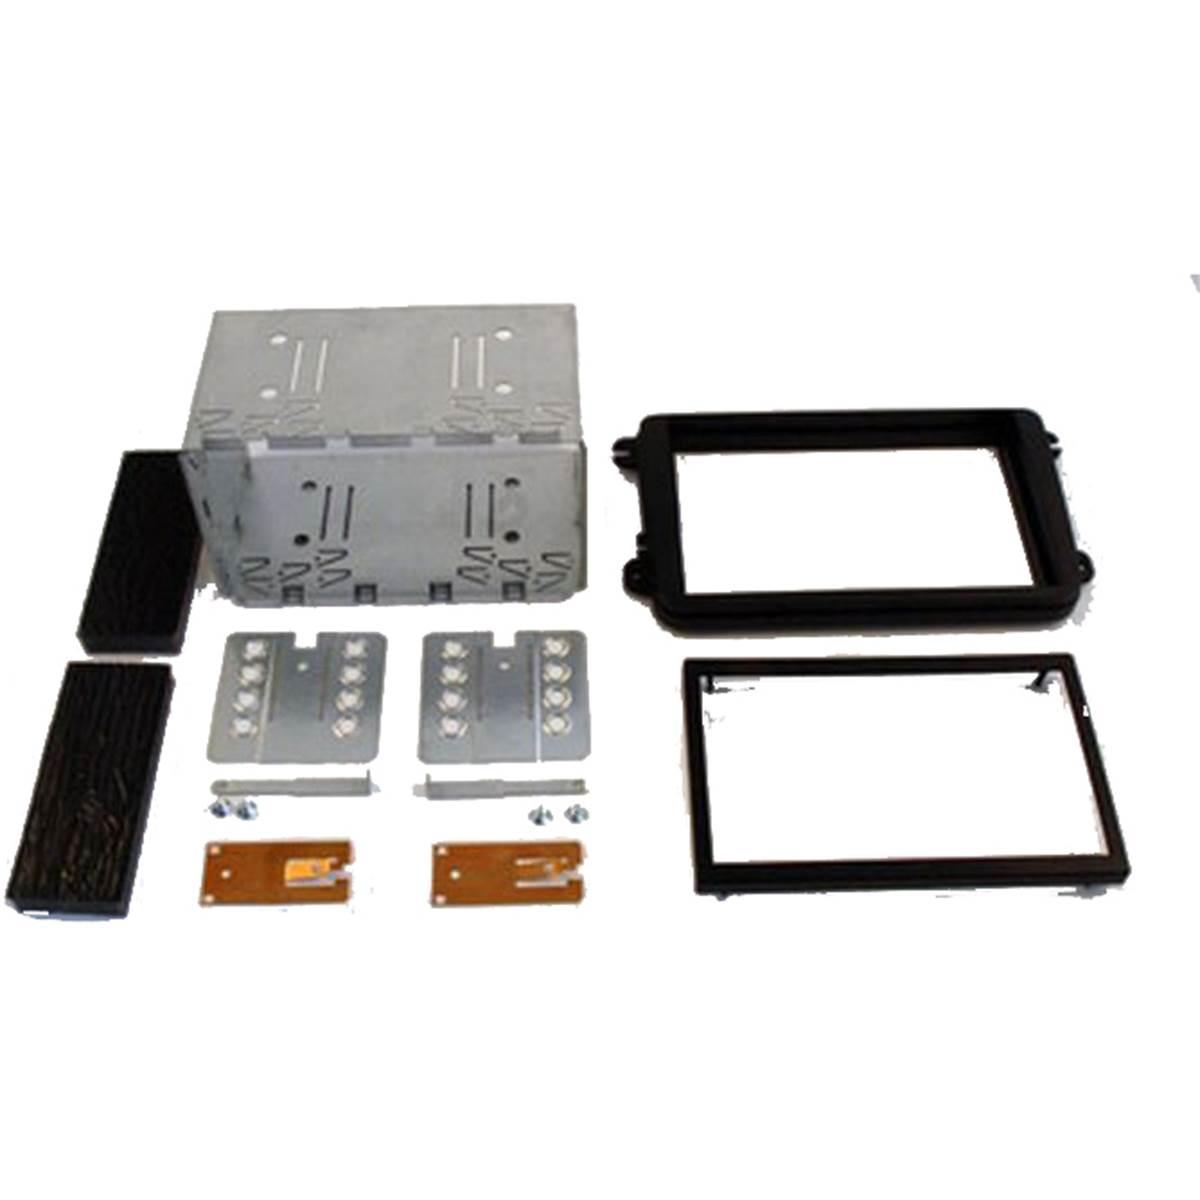 Kit d'intégration autoradio 2DIN pour SKODA FABIA 2007> ROOMSTER 2006> VOLKSWAGEN